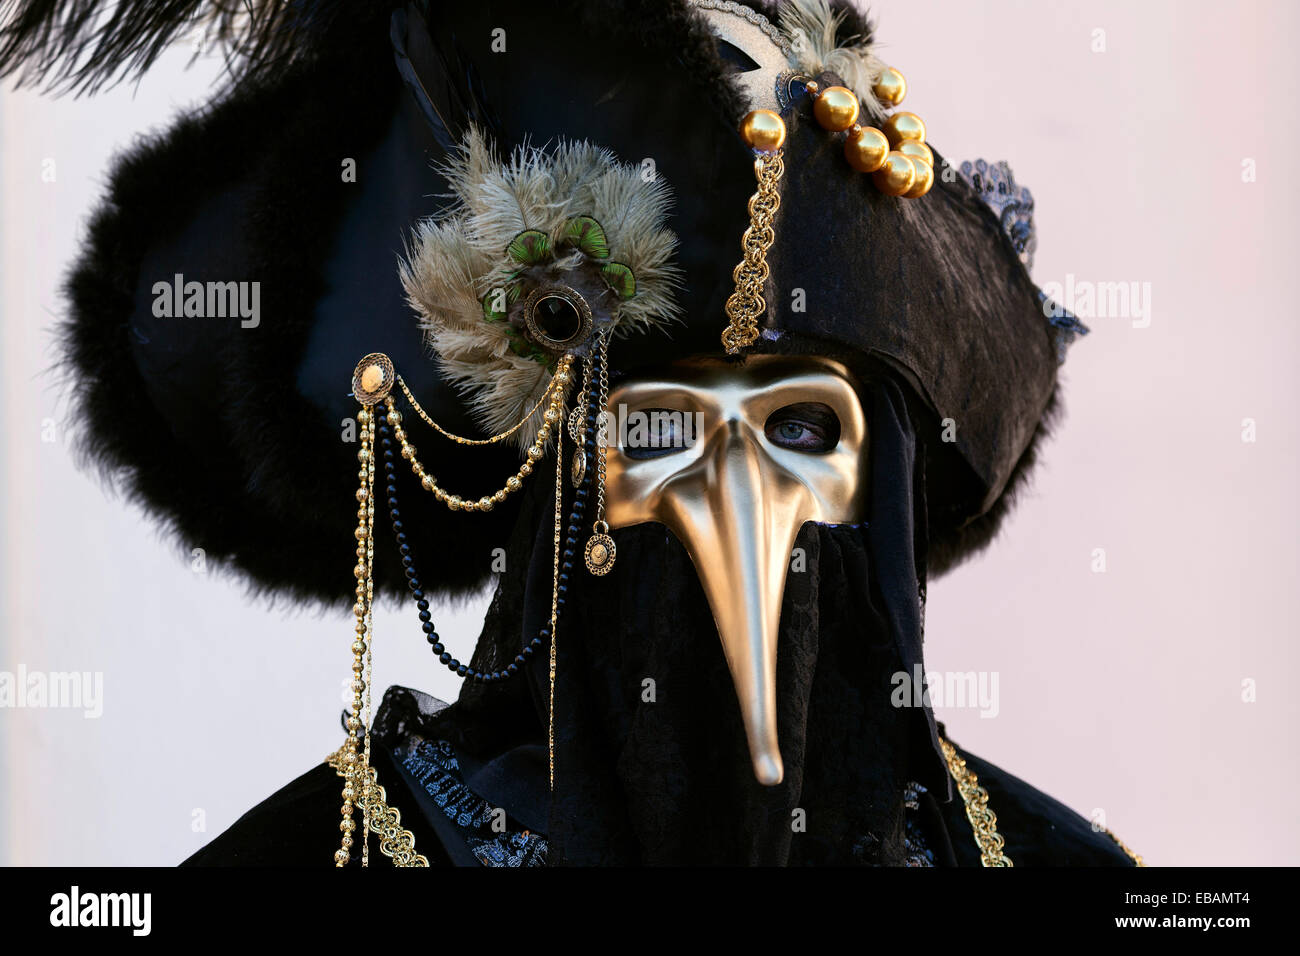 Vénitiens bec Masque pestmaske Phantom Crackle corbeaux Masque Yeux Masque